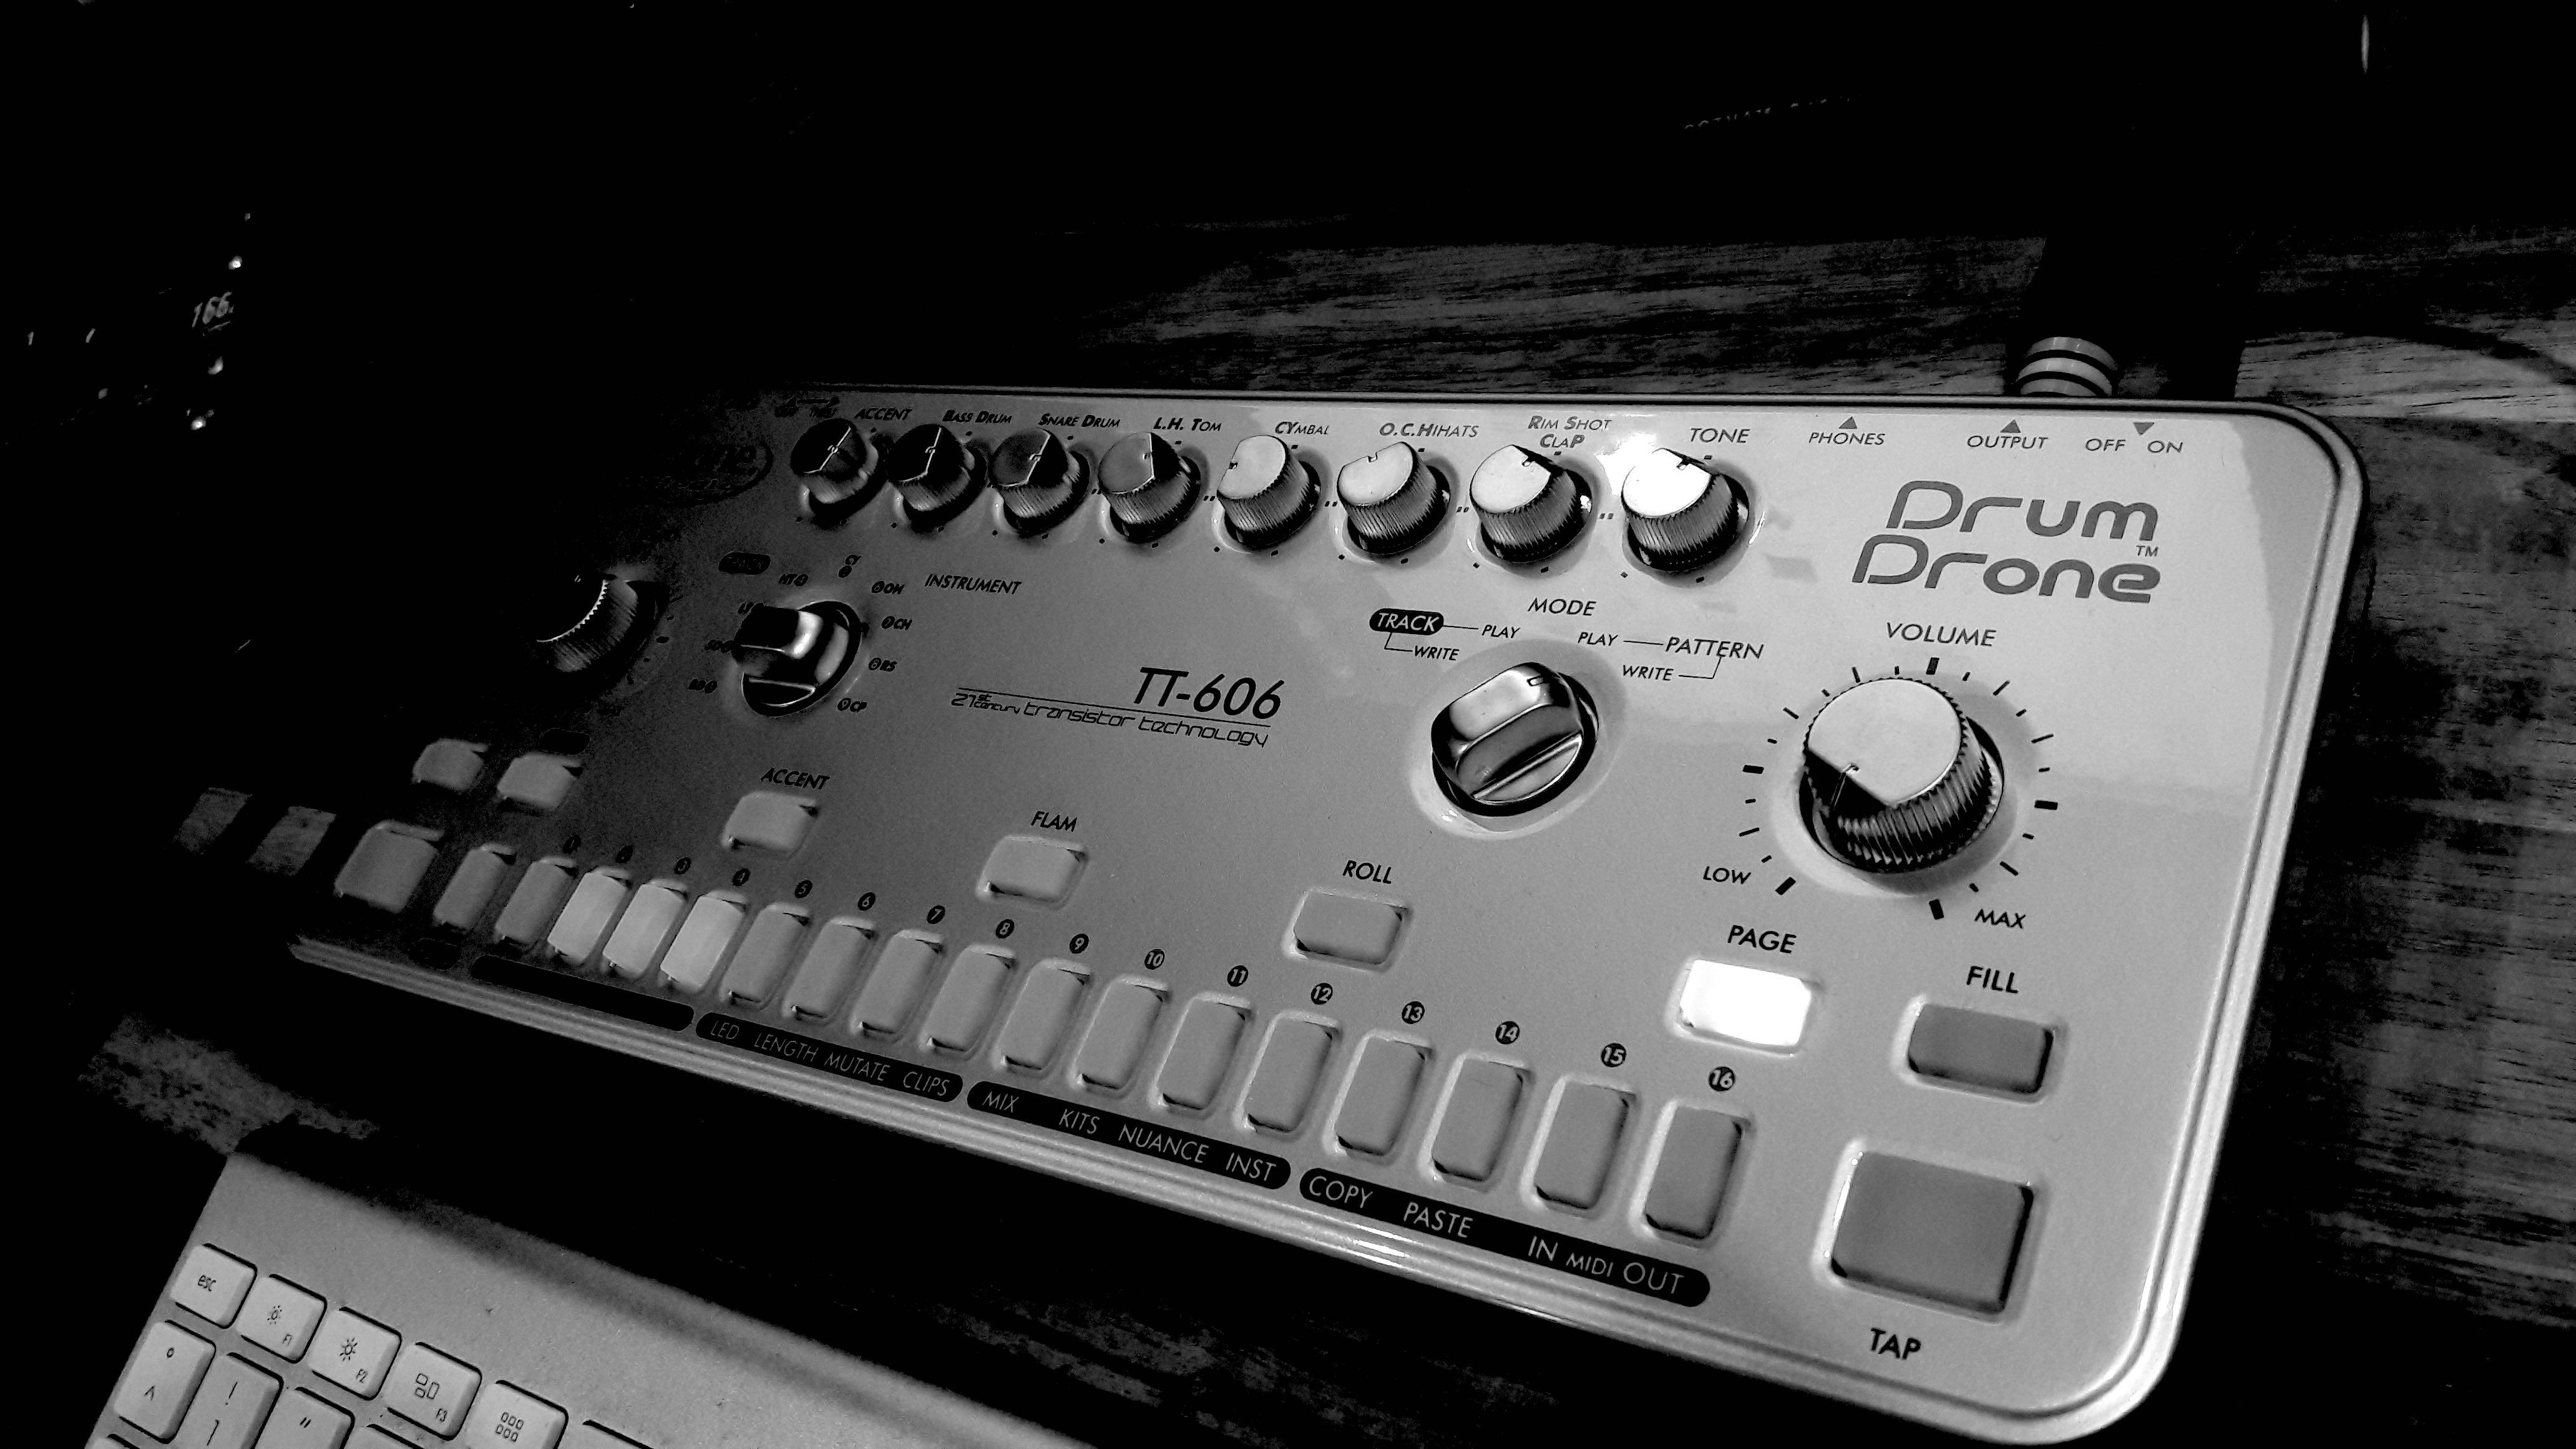 Cyclone Analogic TT-606 a timeless drummachine